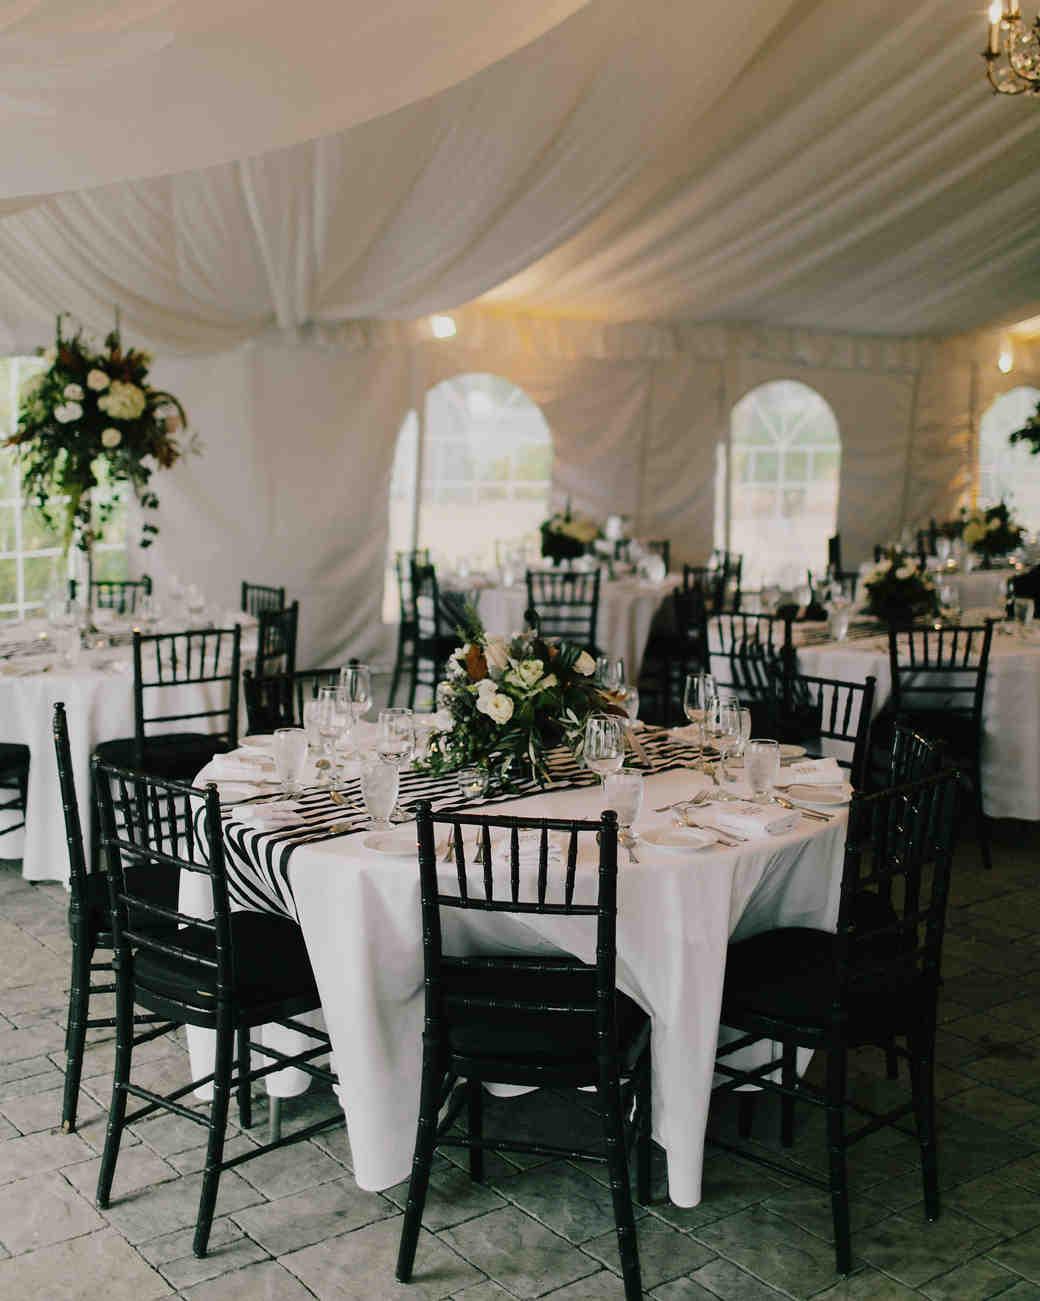 rosie-constantine-wedding-table-282-s112177-1015.jpg